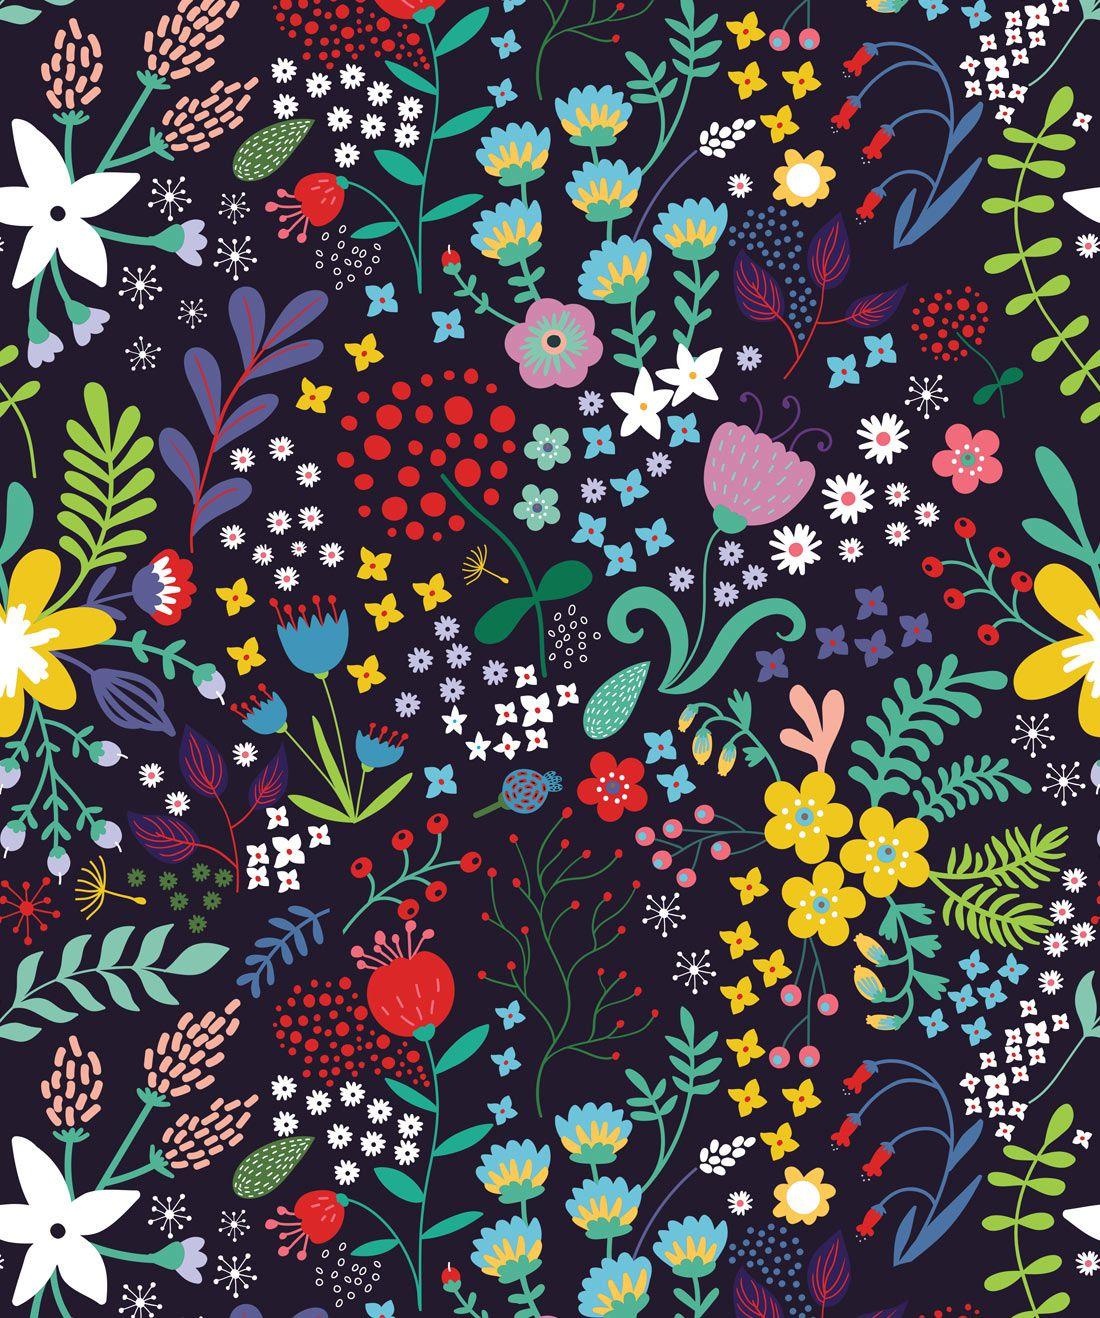 Friday Floral Wallpaper